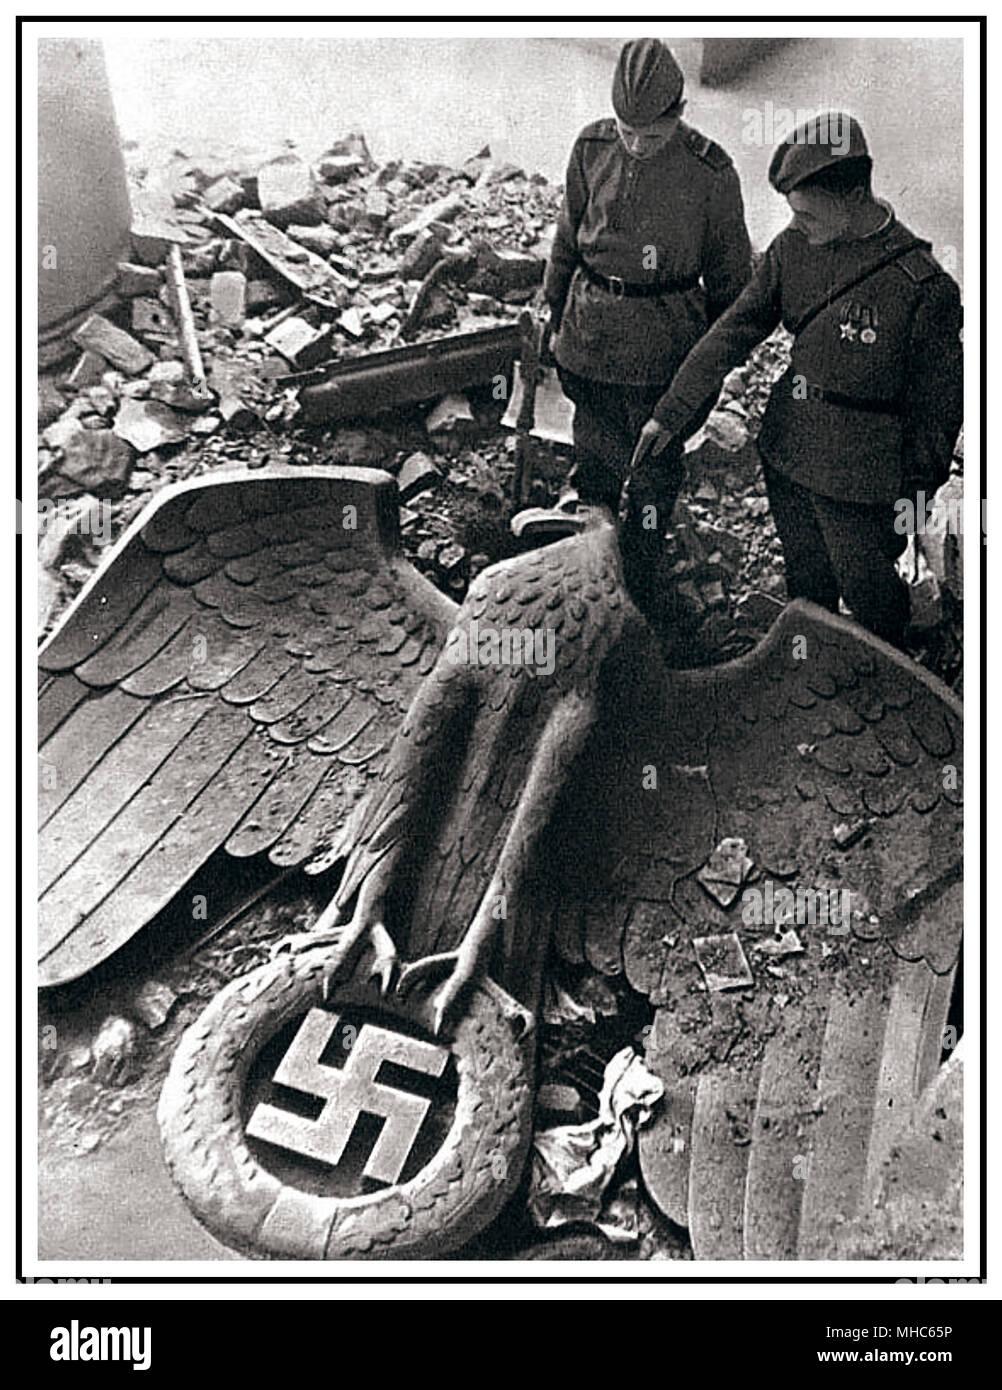 Swastika in Soviet Russia 2